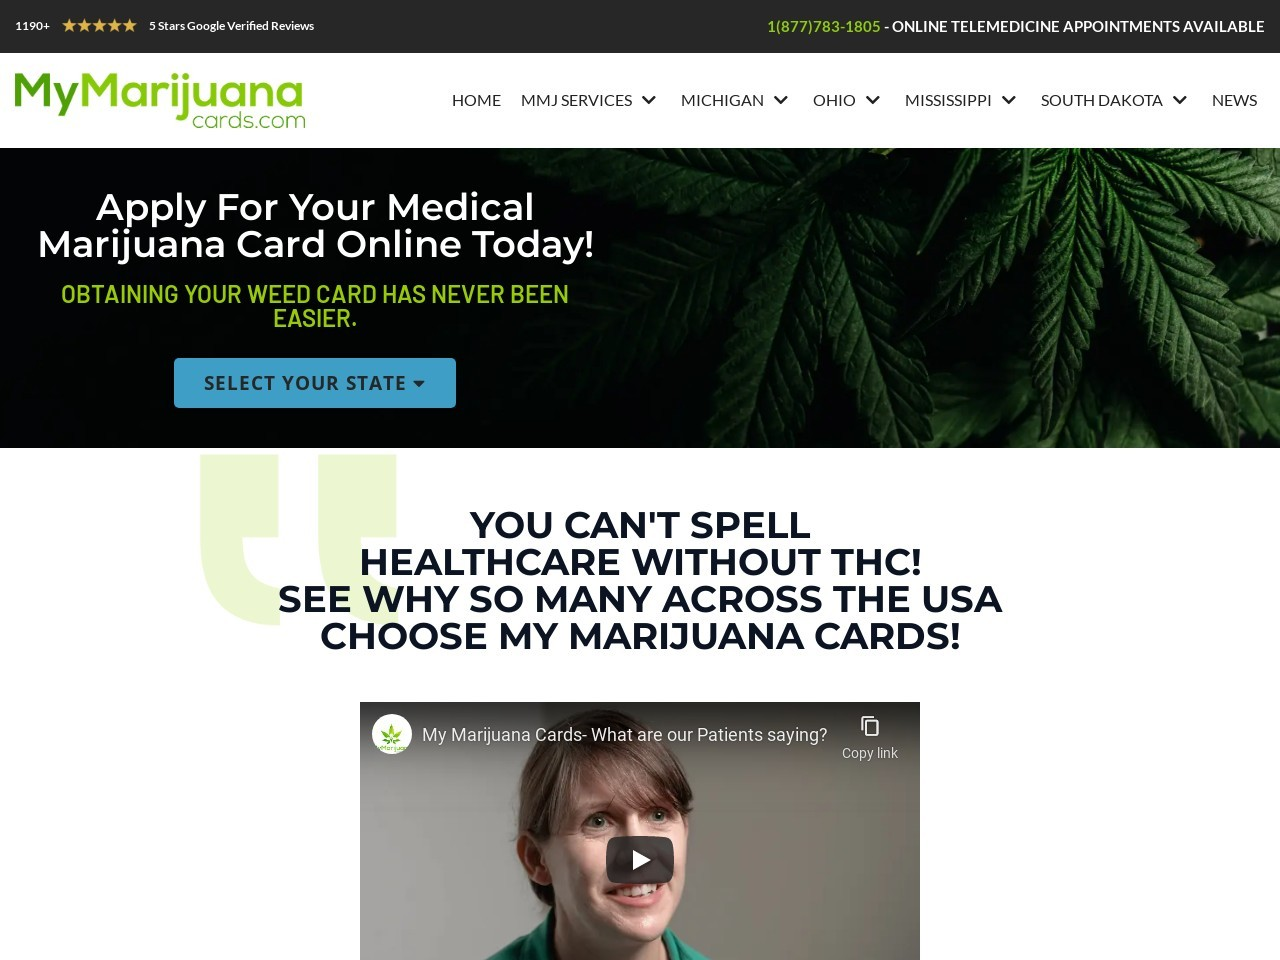 Obtain all services of Michigan Medical Marijuana